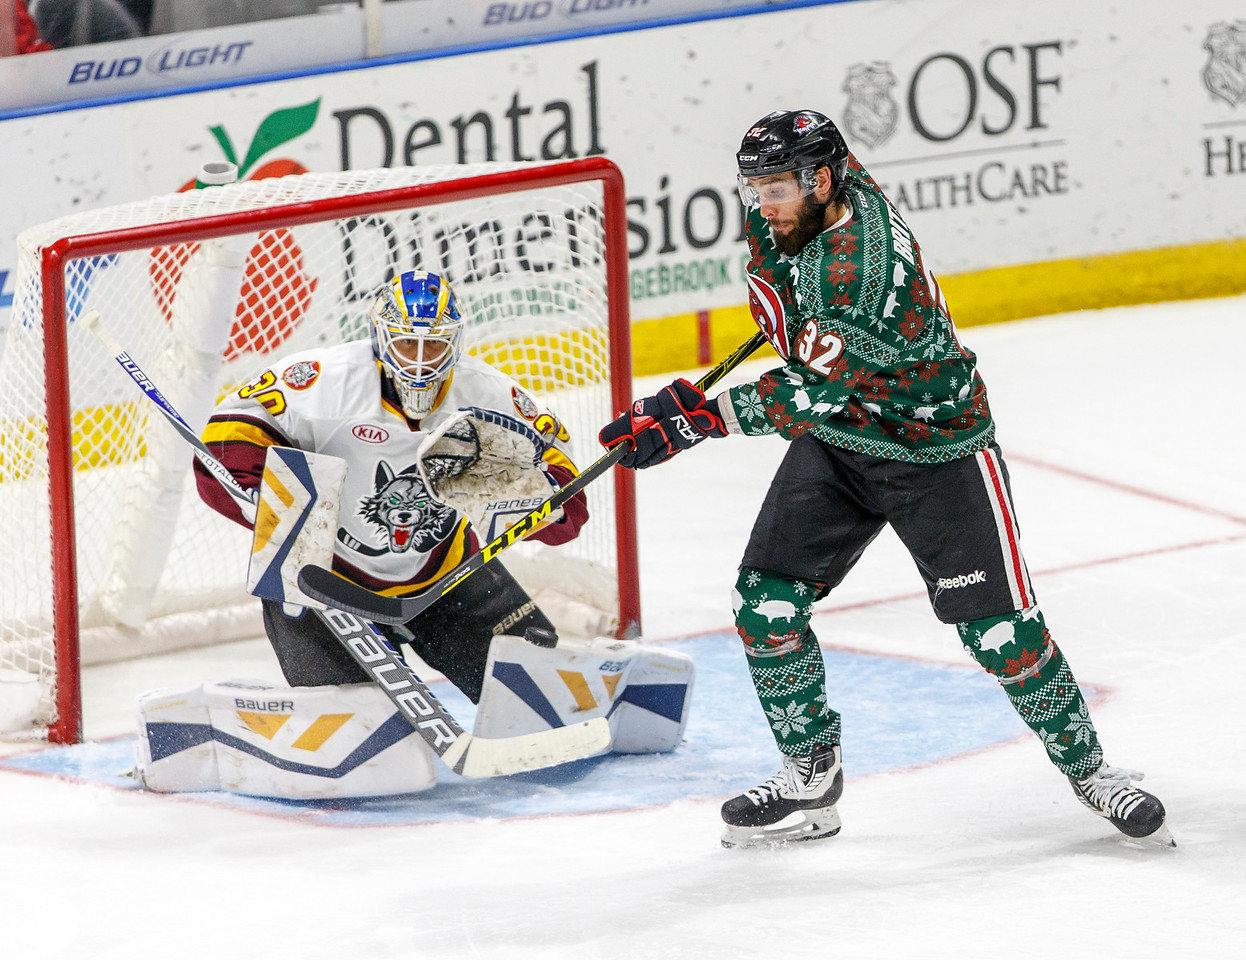 IMAGE: http://www.reicherstudios.com/Sports/HockeyPhotos/IceHogs-20152016/11-27-15-IceHogs-vs-Wolves/i-W6JCkNv/0/X2/CC6Q0598_4256-X2.jpg